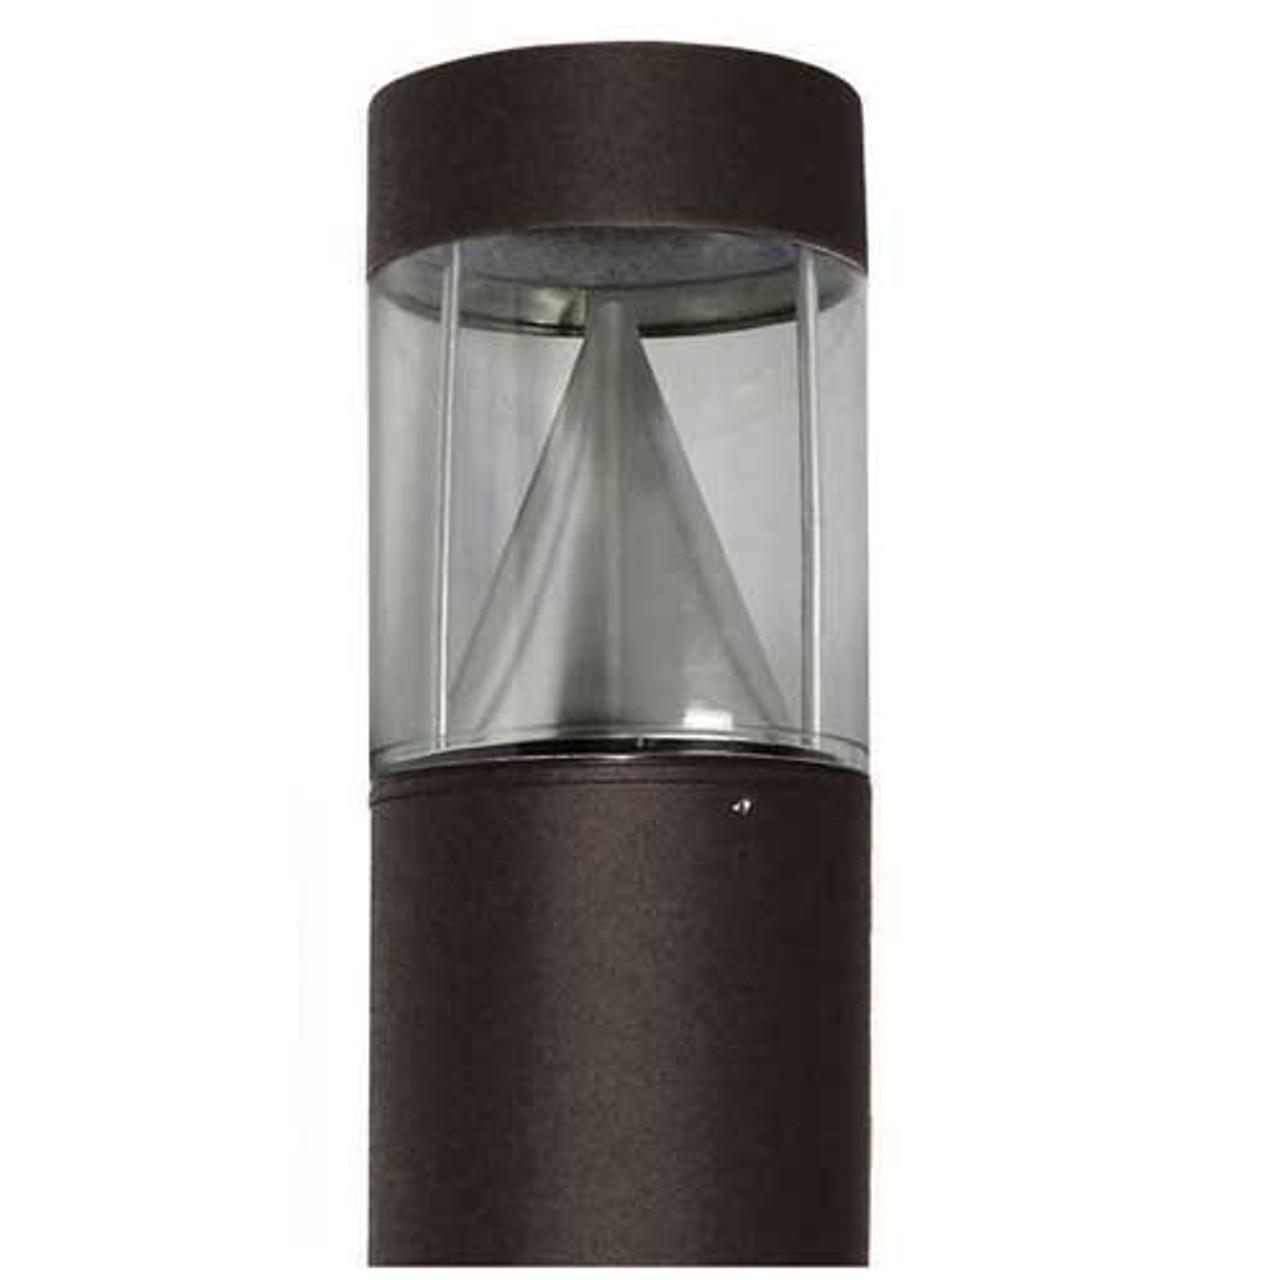 15 Watt LED Lighting Bollard Flat Top Cone Reflector